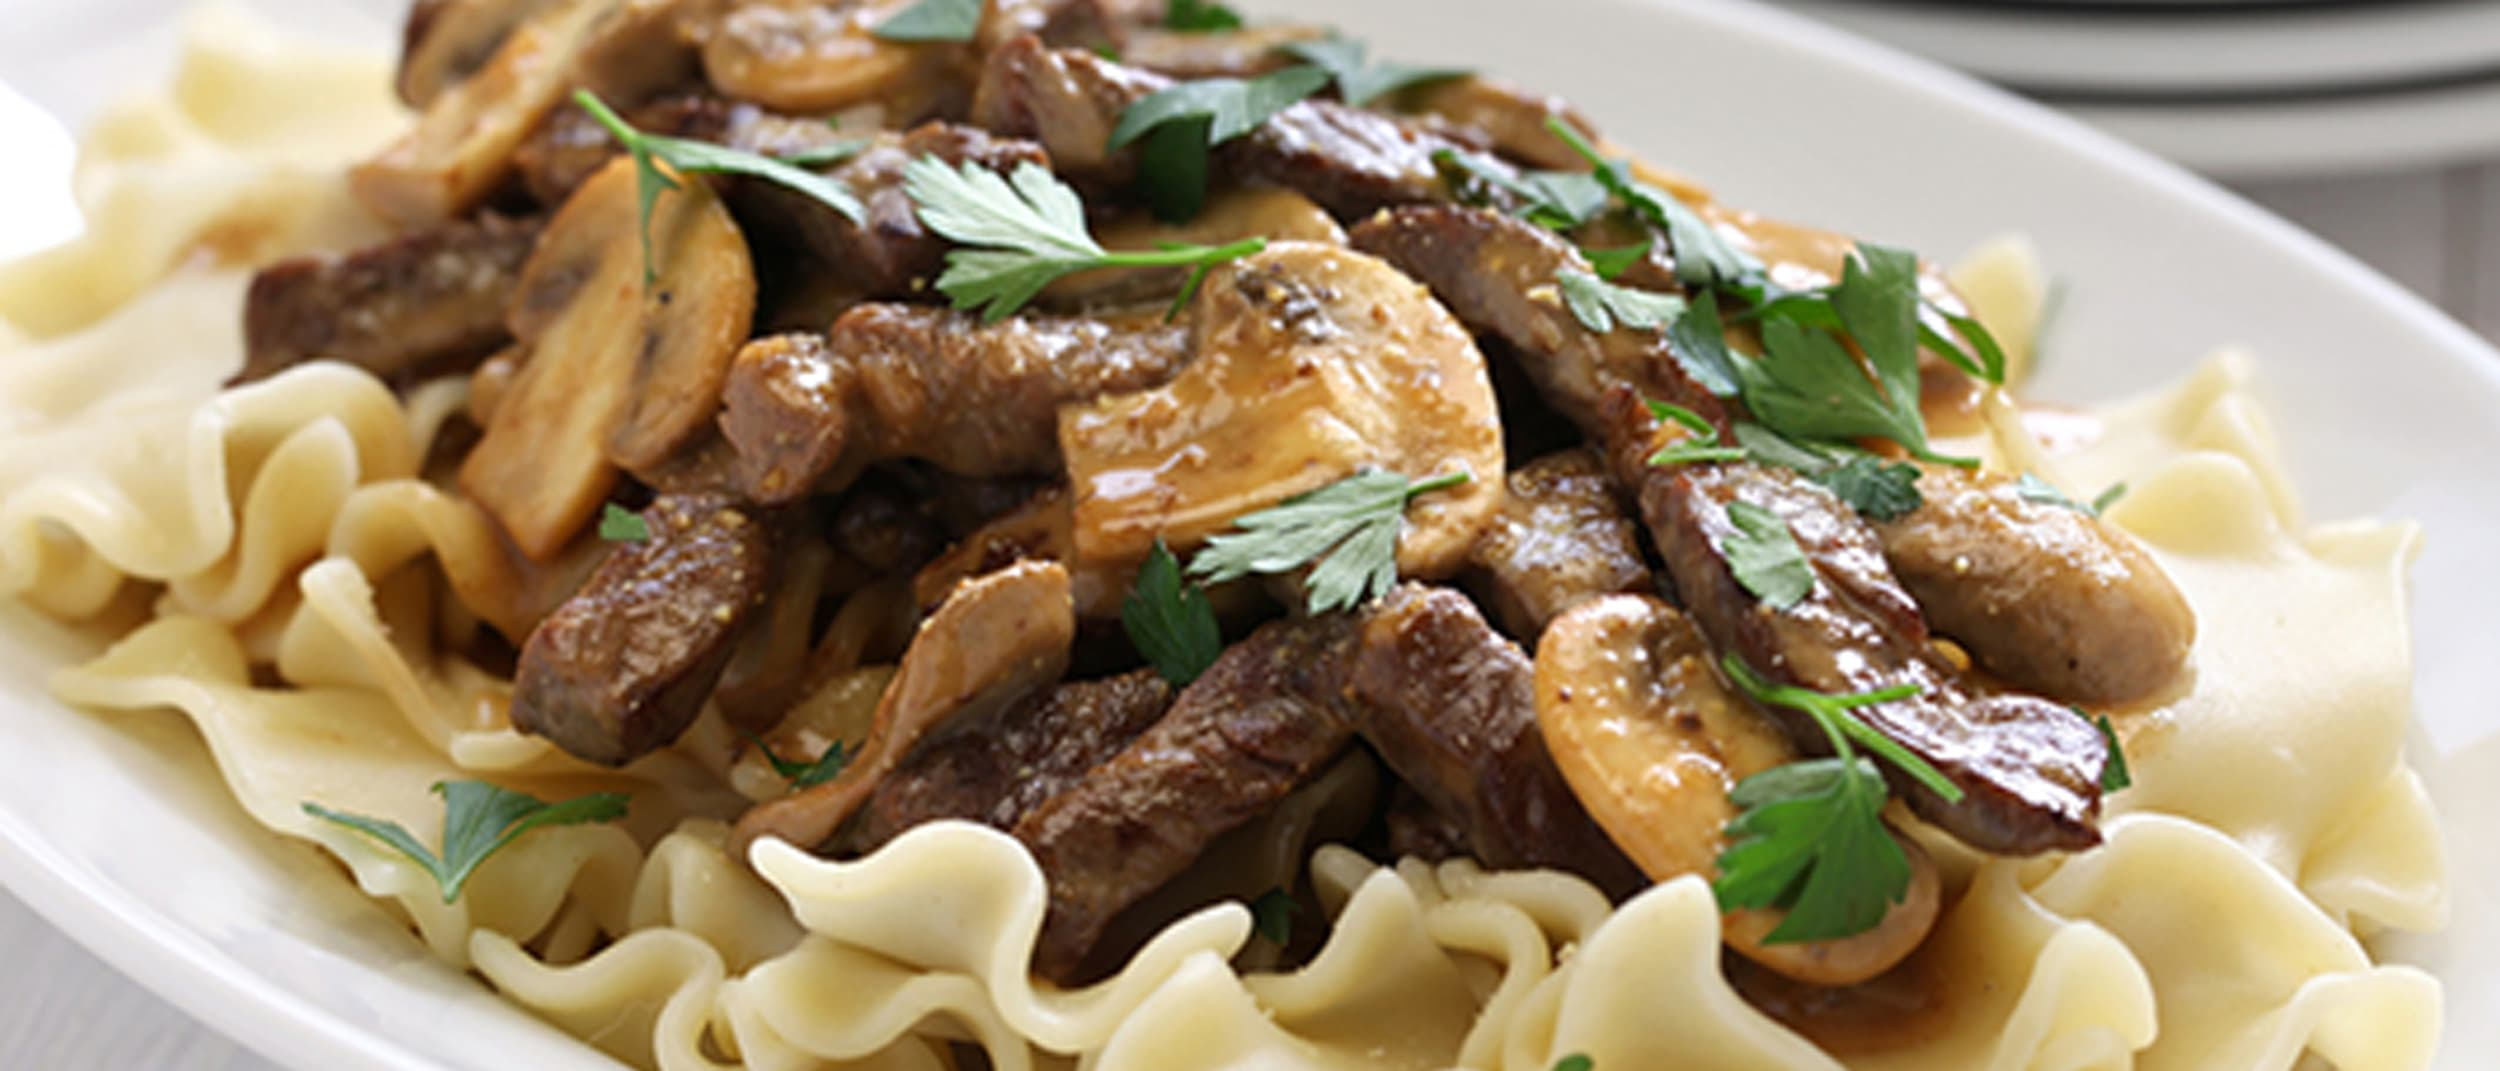 Beef Stroganoff recipe from PAK'nSAVE